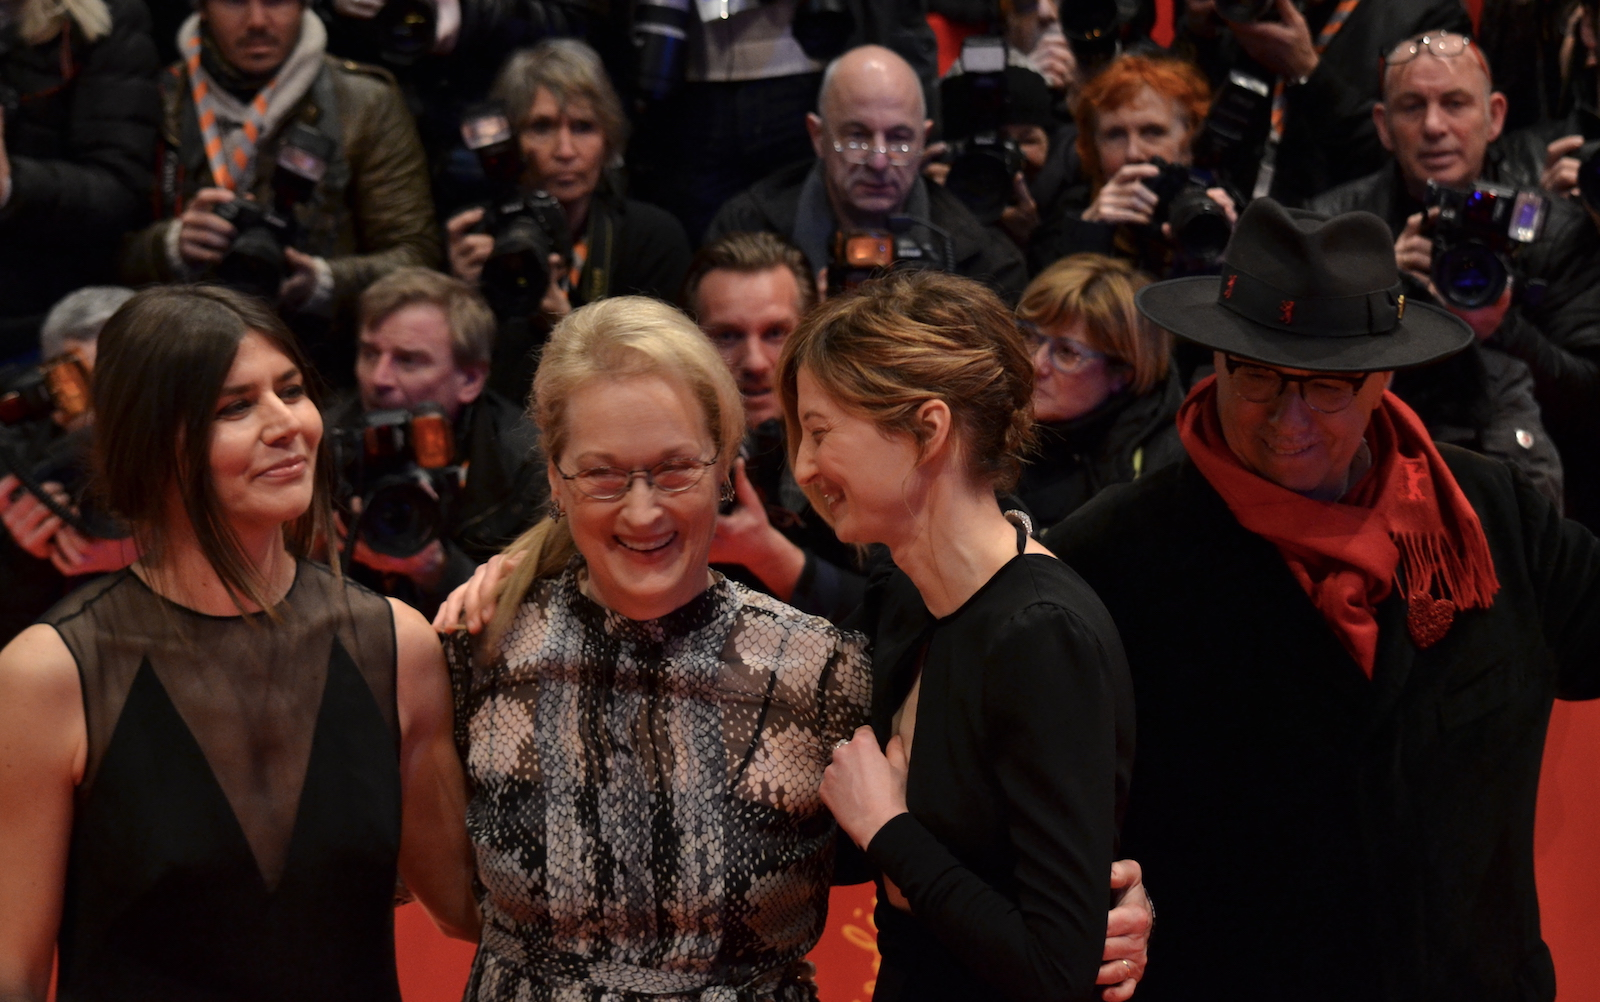 Berlino 2016: Meryl Streep, Małgorzata Szumowska, Alba Rohrwachersul red carpet